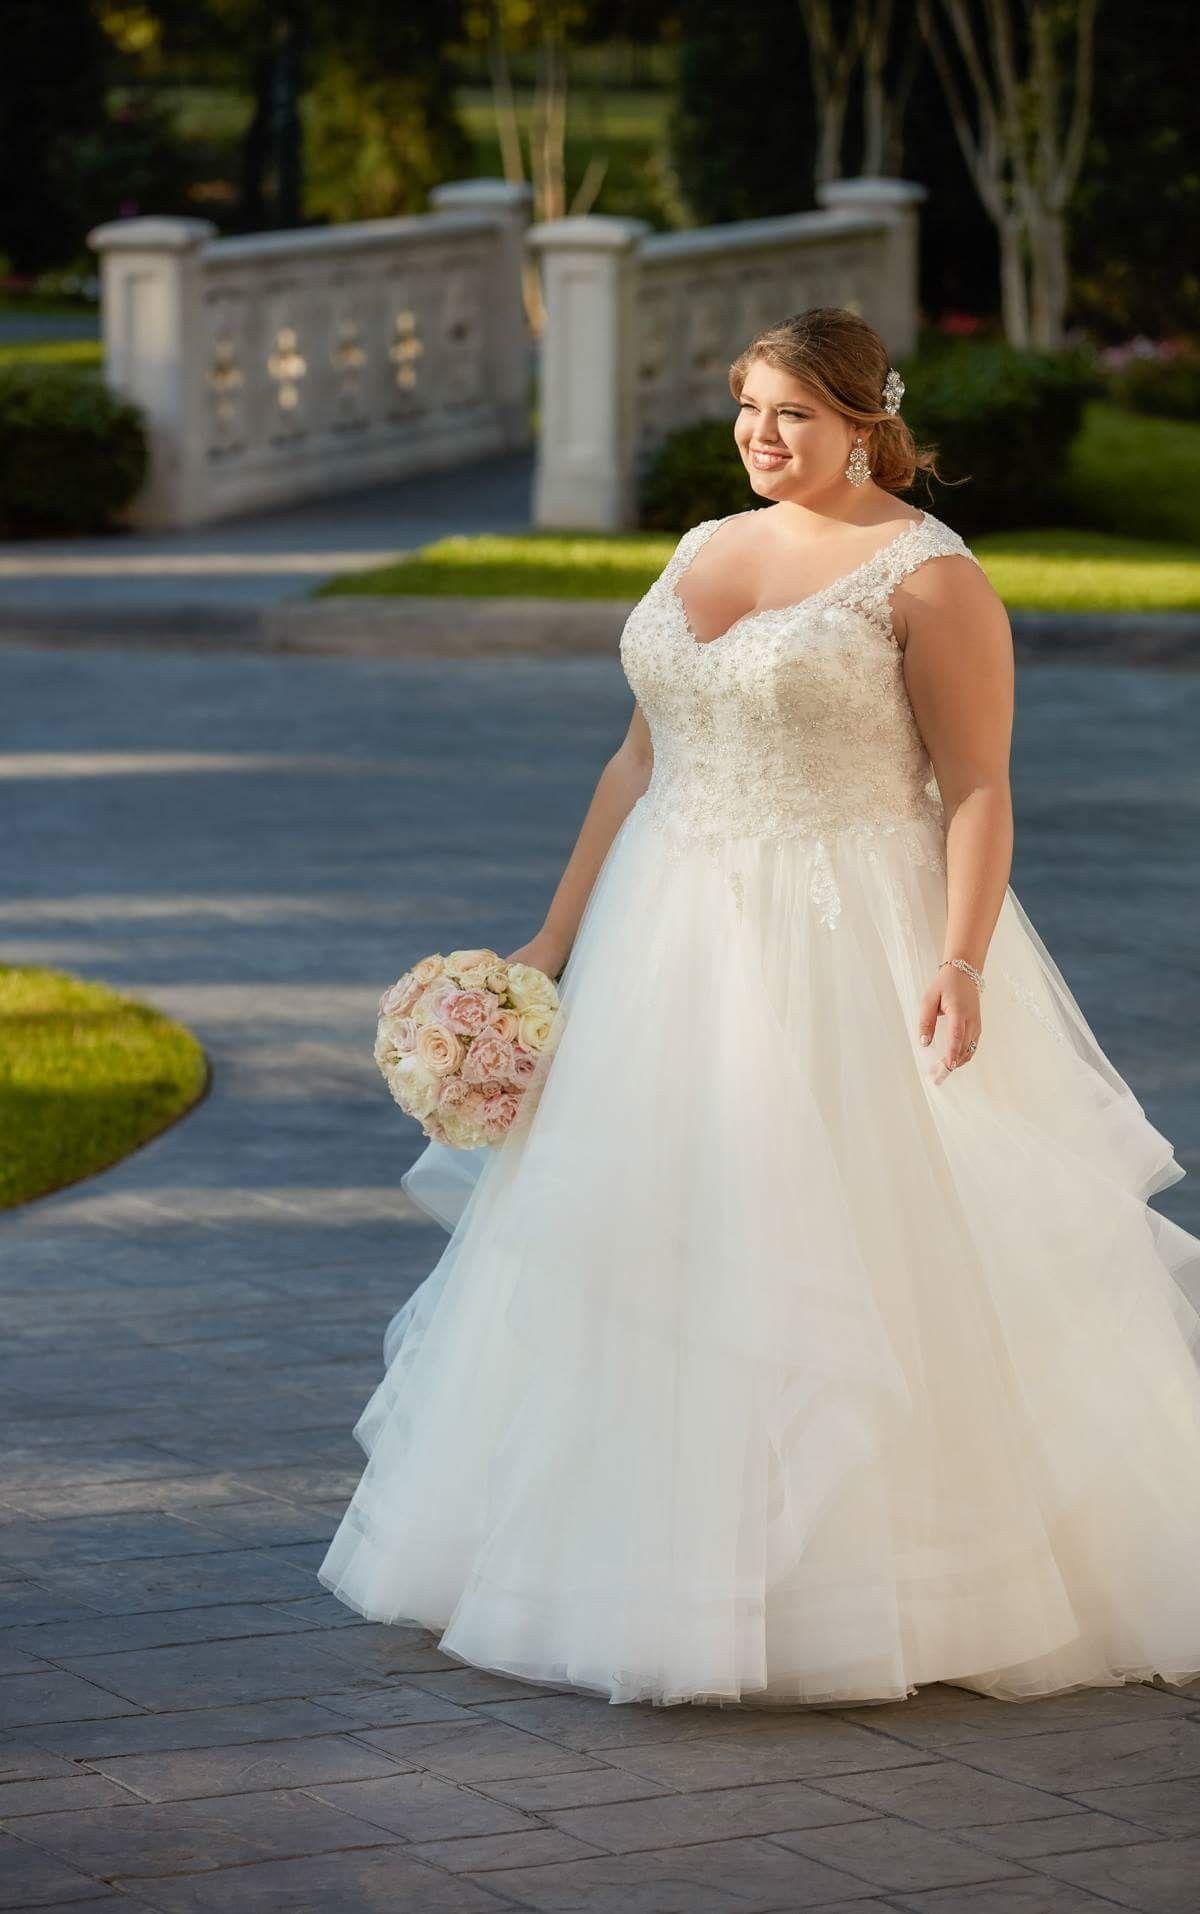 Slimmingbodyshapers Bra Friendly Plus Size Wedding Gown Visit Our